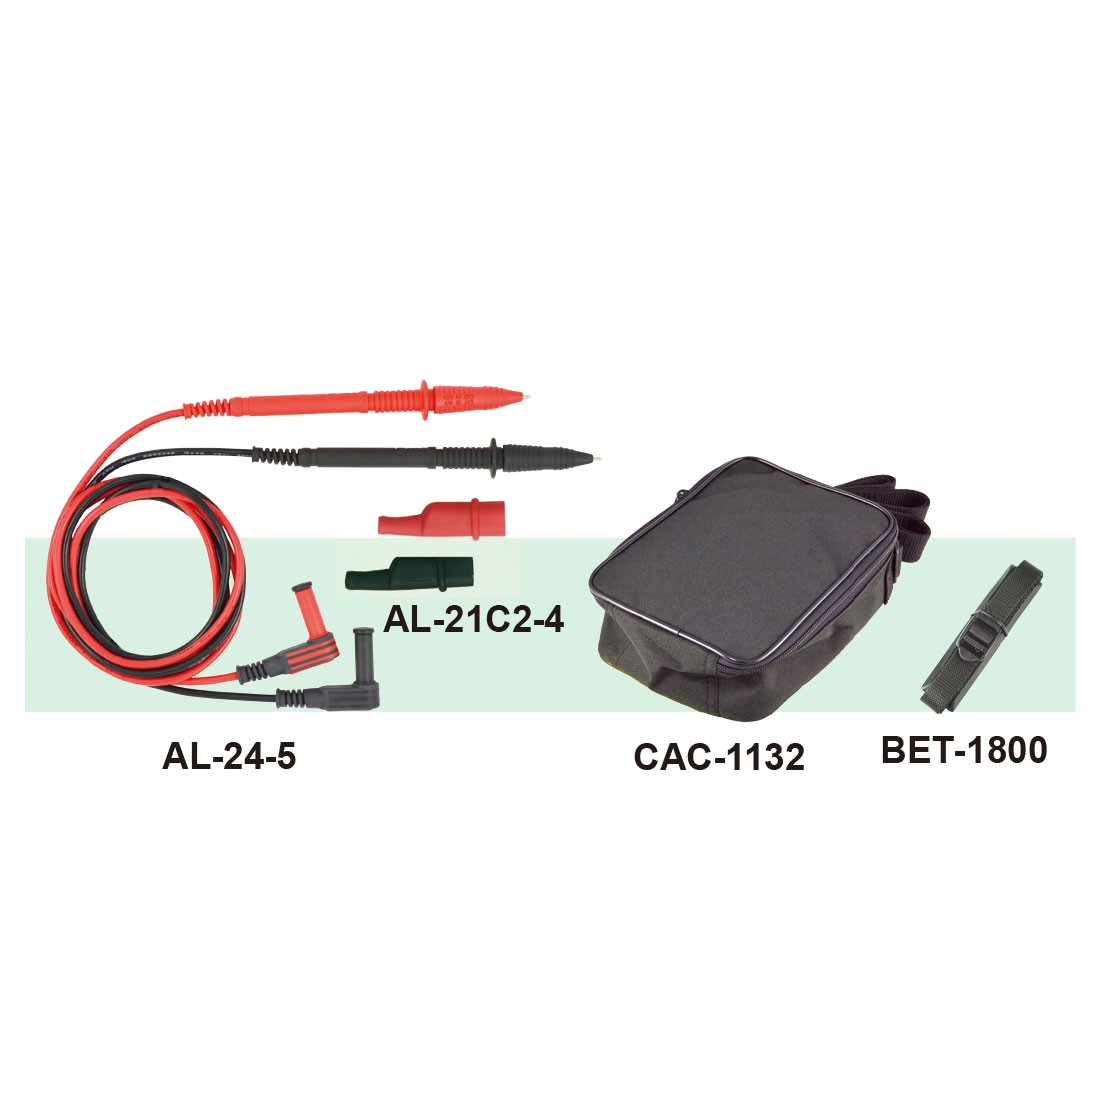 1131IN Series: Analogue (1kV below) Insulation Tester